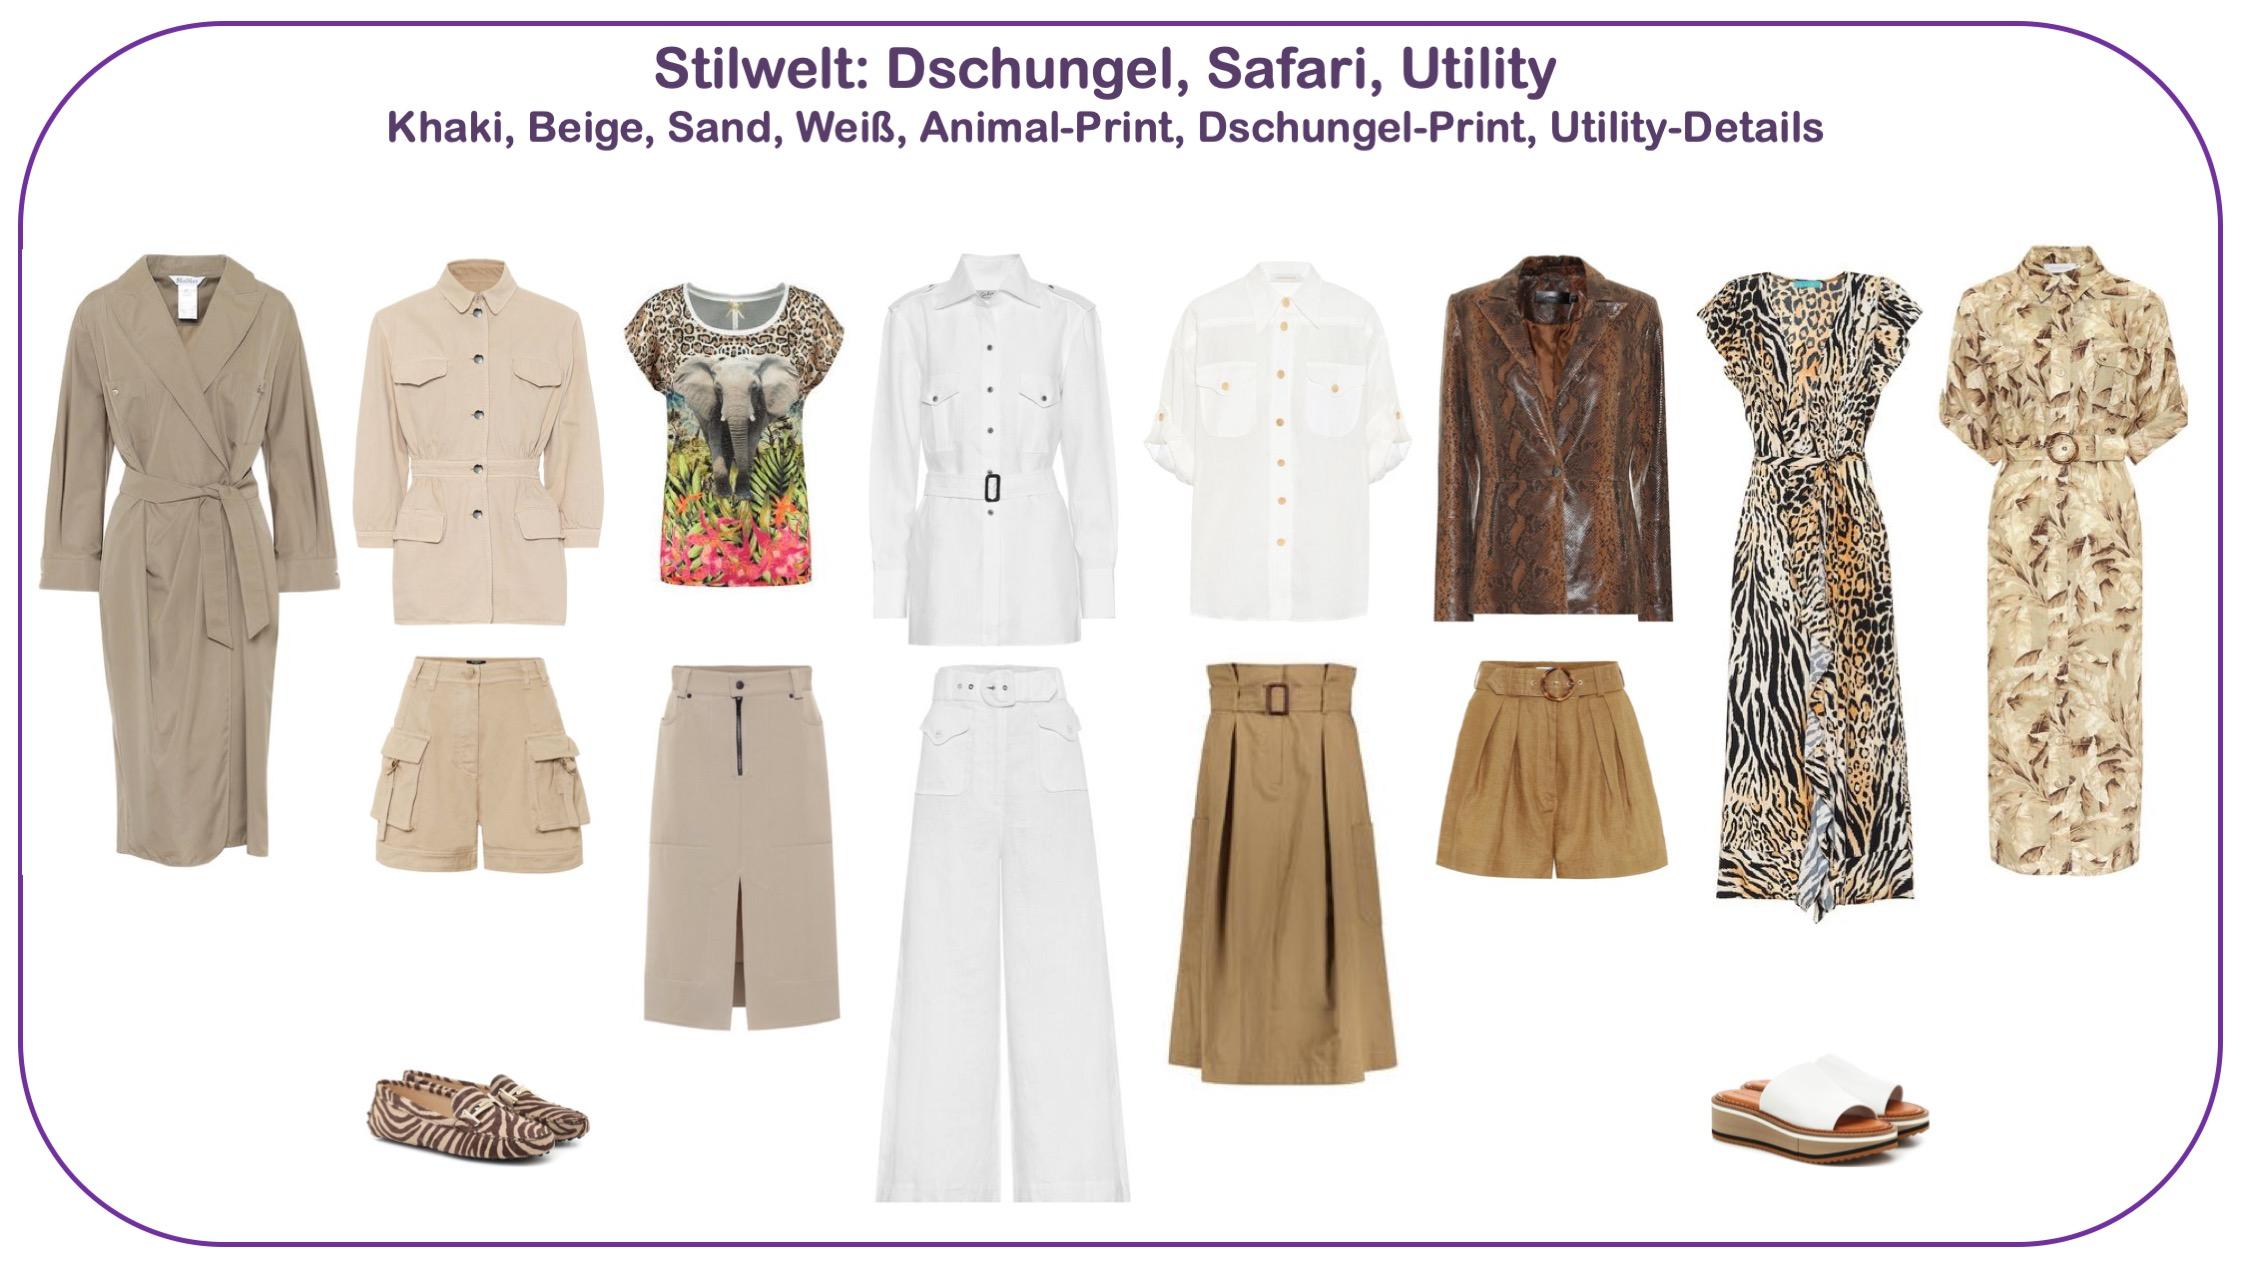 Modetrends Frühjahr/Sommer 2020 - Stilwelt Safari, Utility